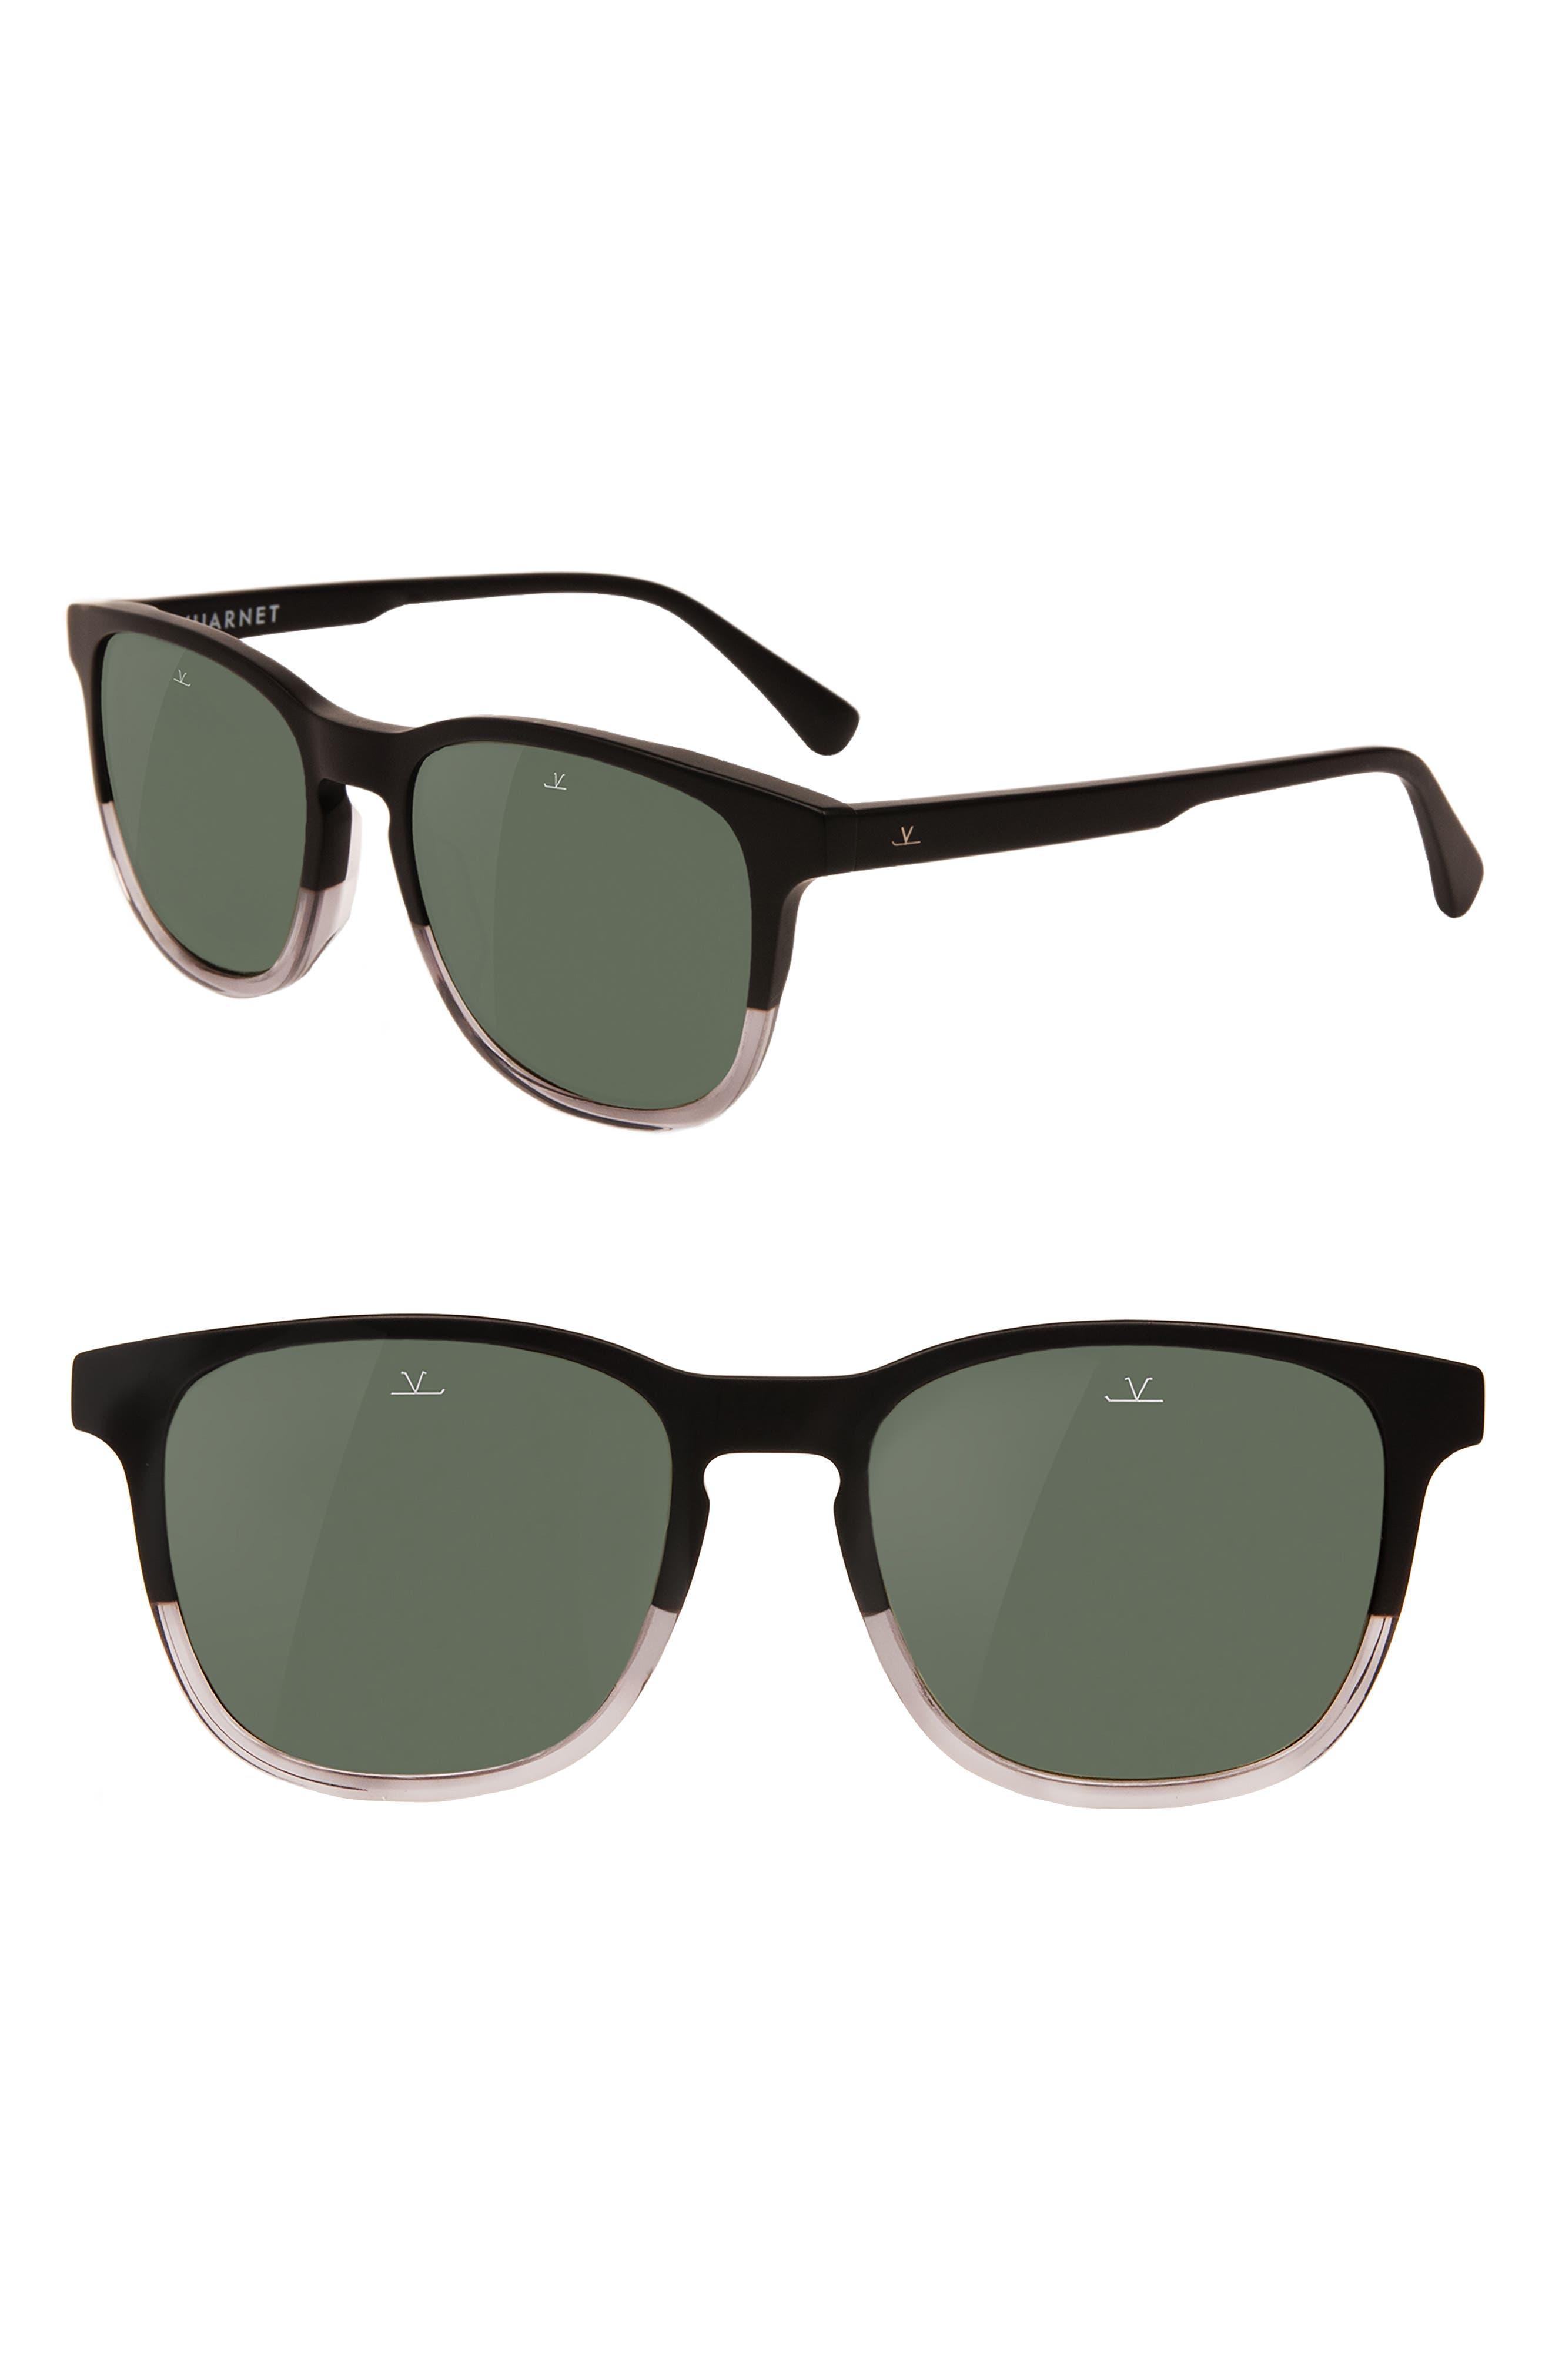 District Medium 53mm Polarized Sunglasses,                             Main thumbnail 1, color,                             Matt Black/ Grey Polarized